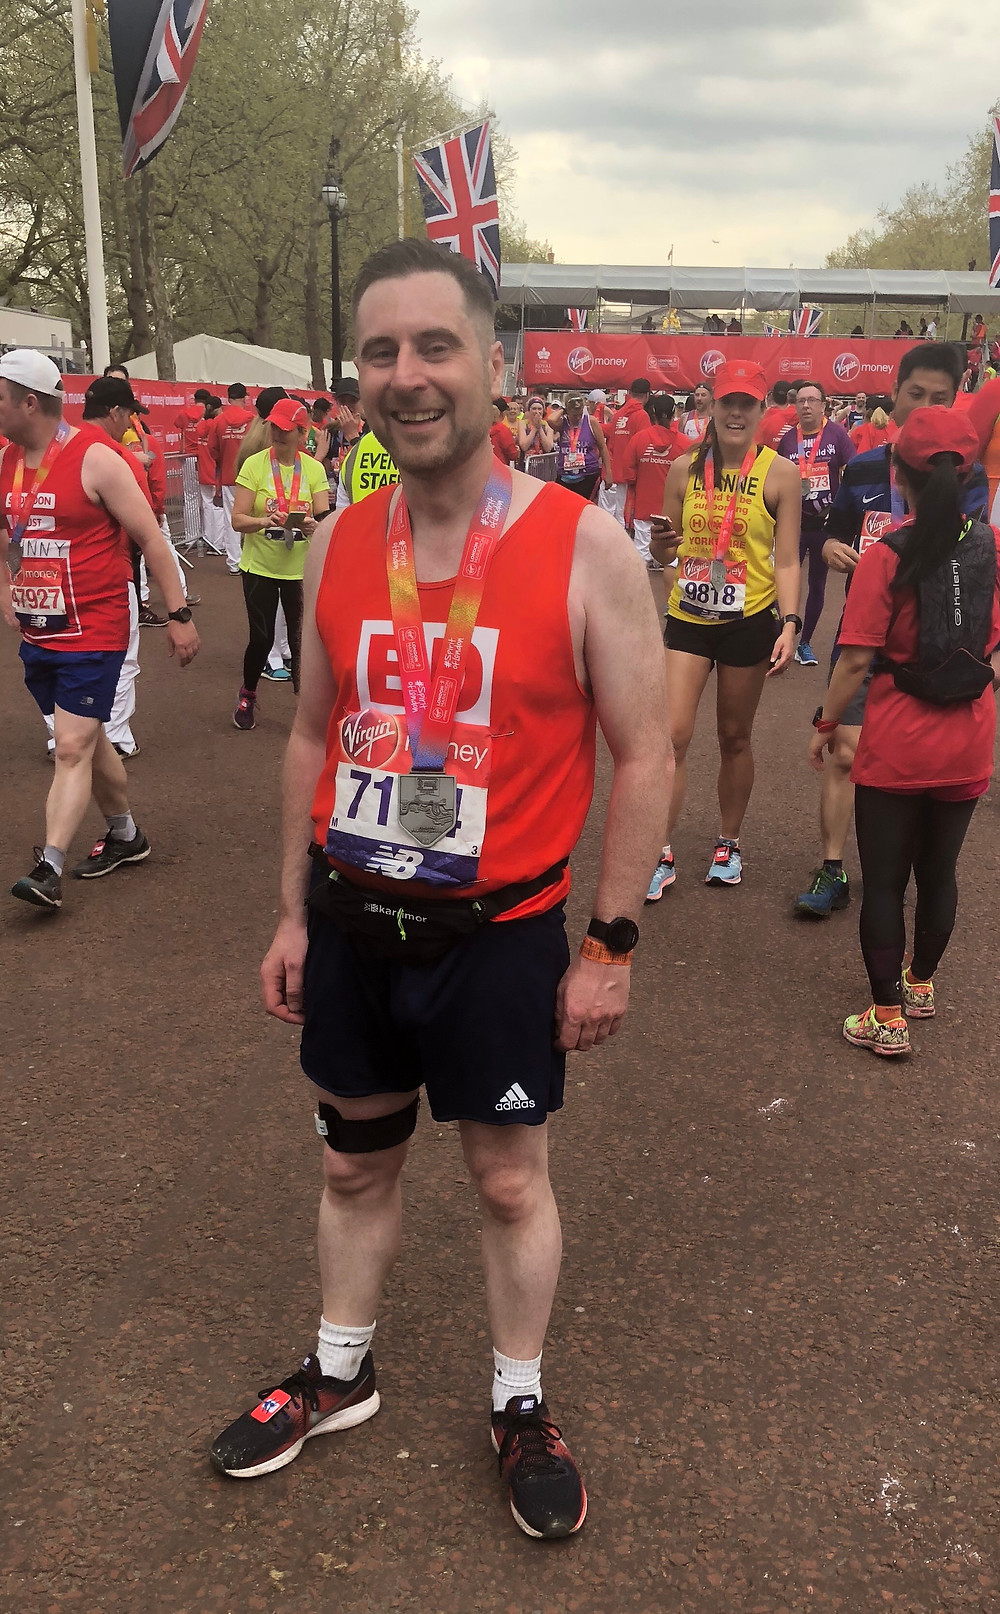 Ed Scott ran VLM 2018